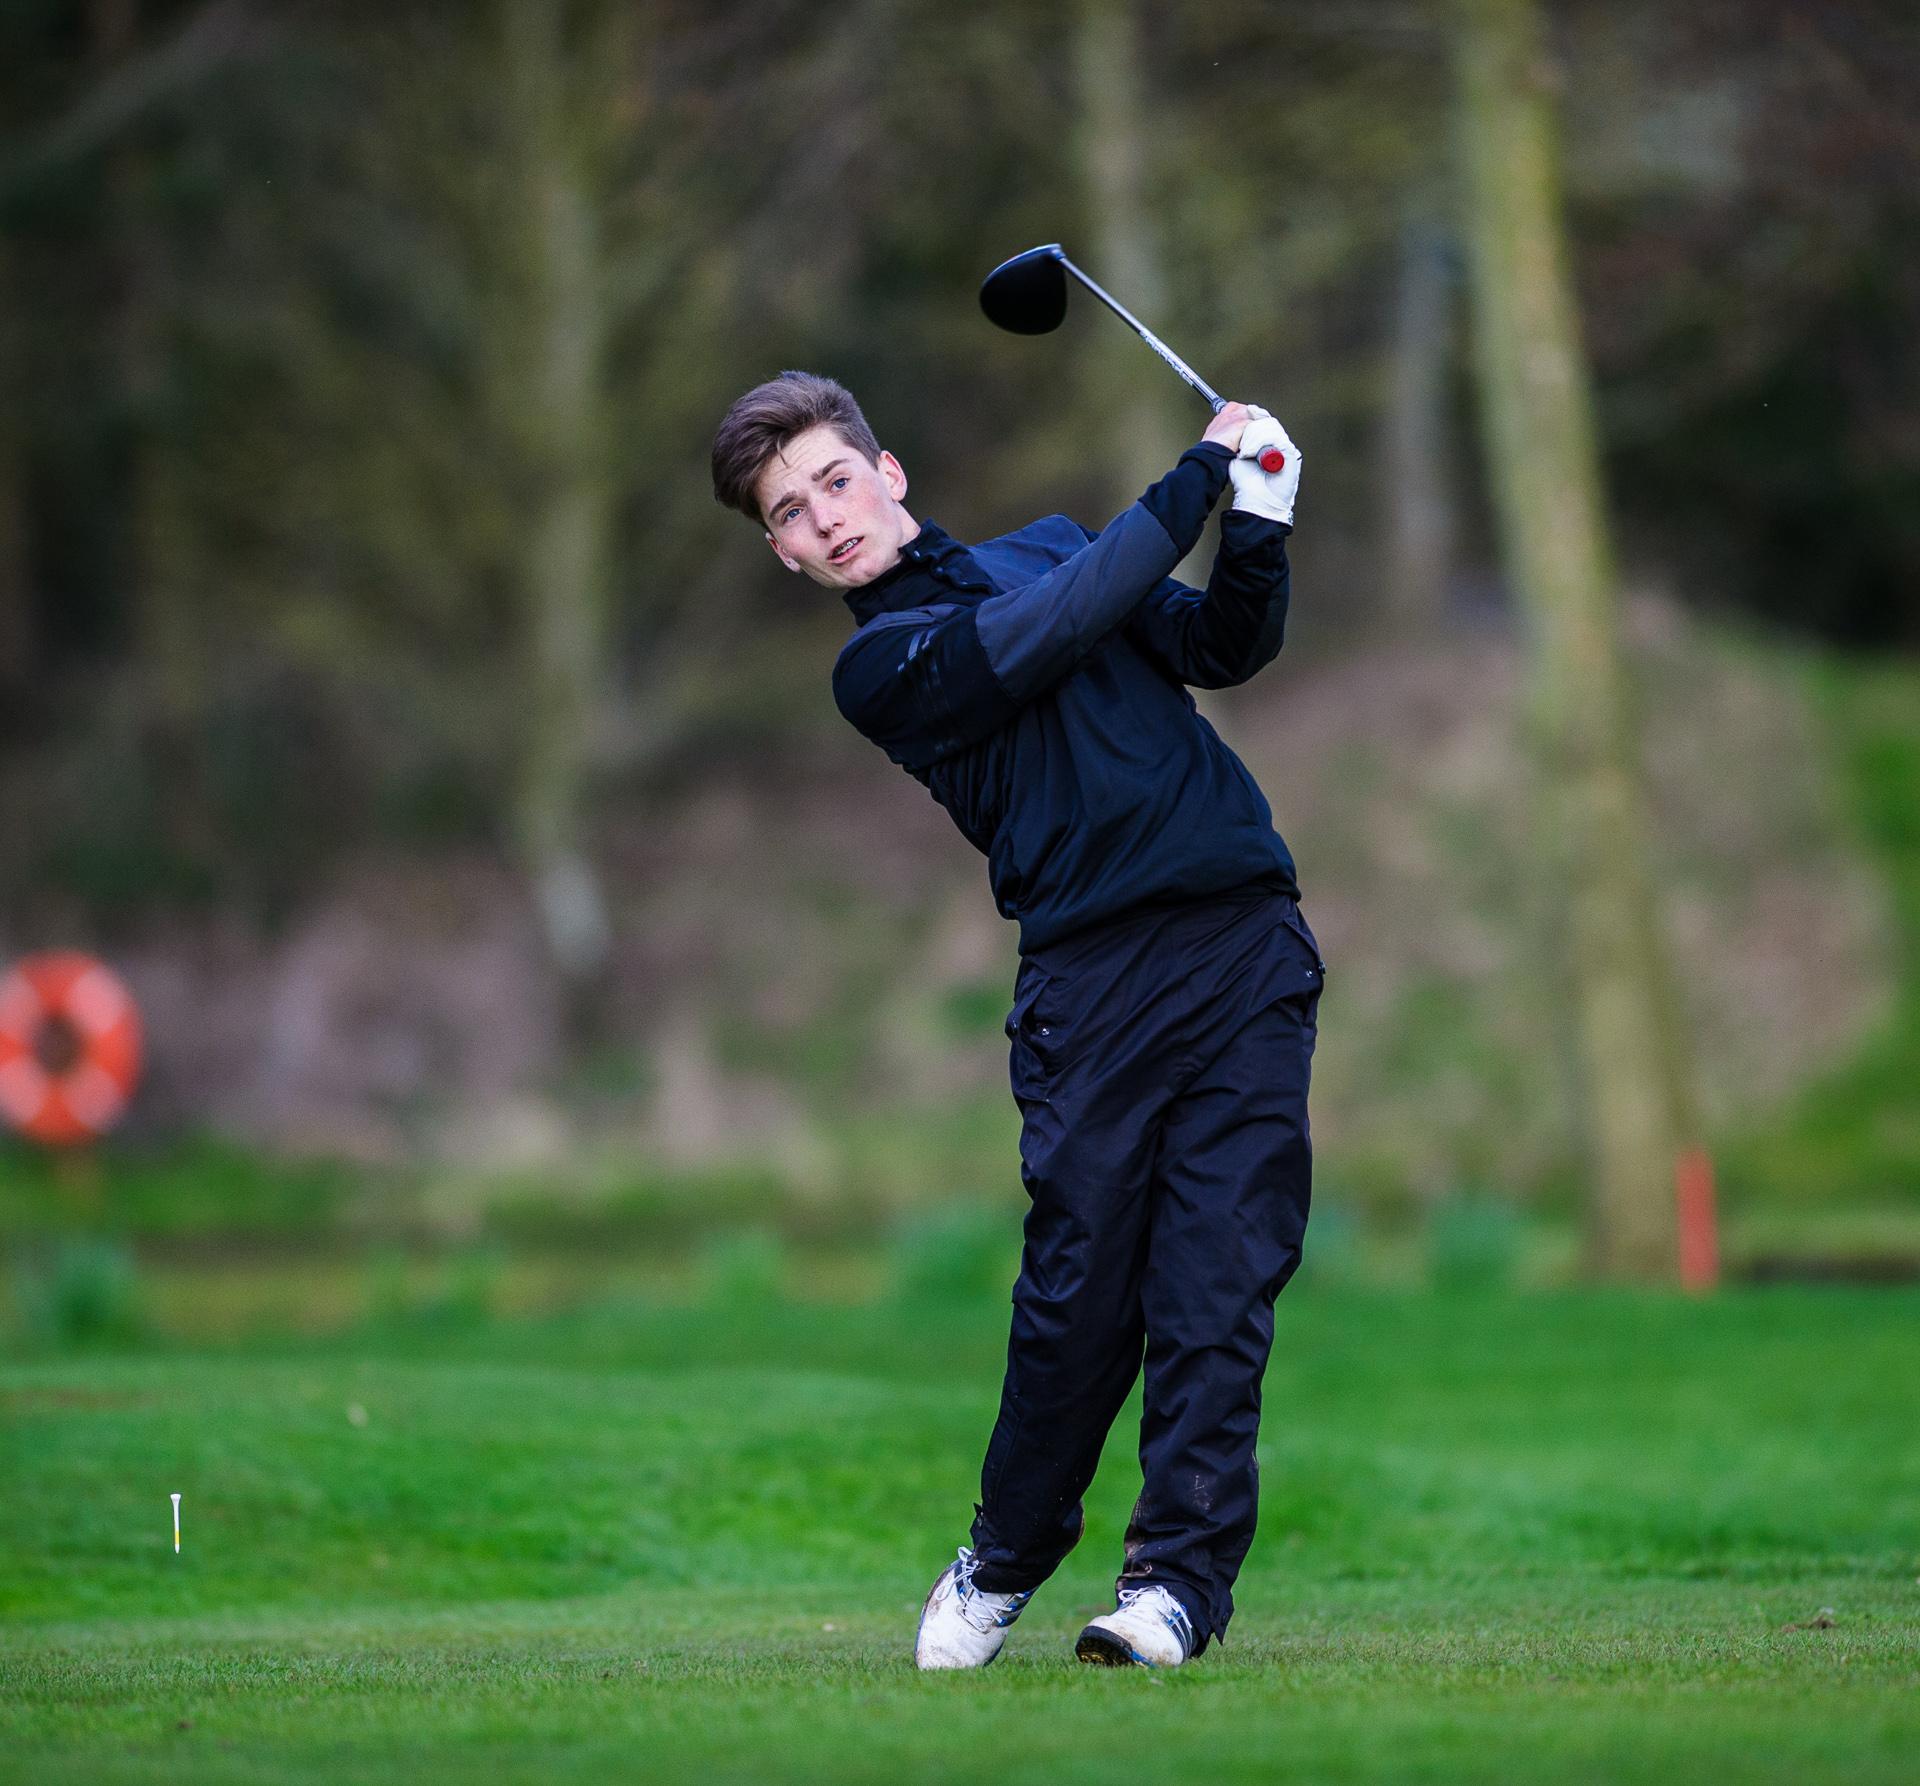 Kevindiss.com golf course photography Hawkstone Park golf course-2-57.jpg